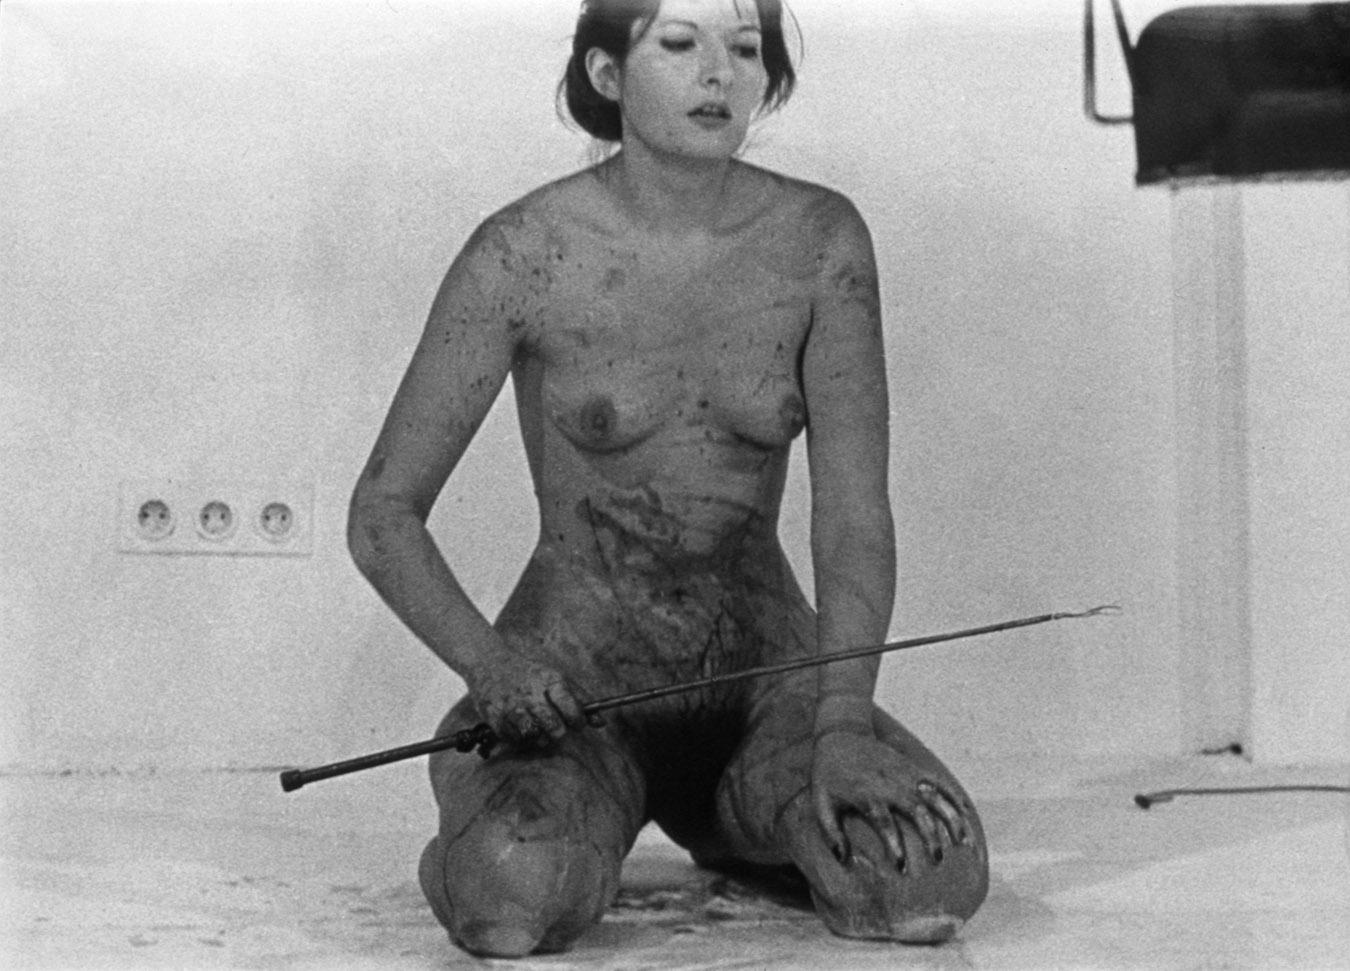 LIPS OF THOMAS, Performance, 2 hours, Krinzinger Gallery, Innbruck, 1975 © Marina Abramovic